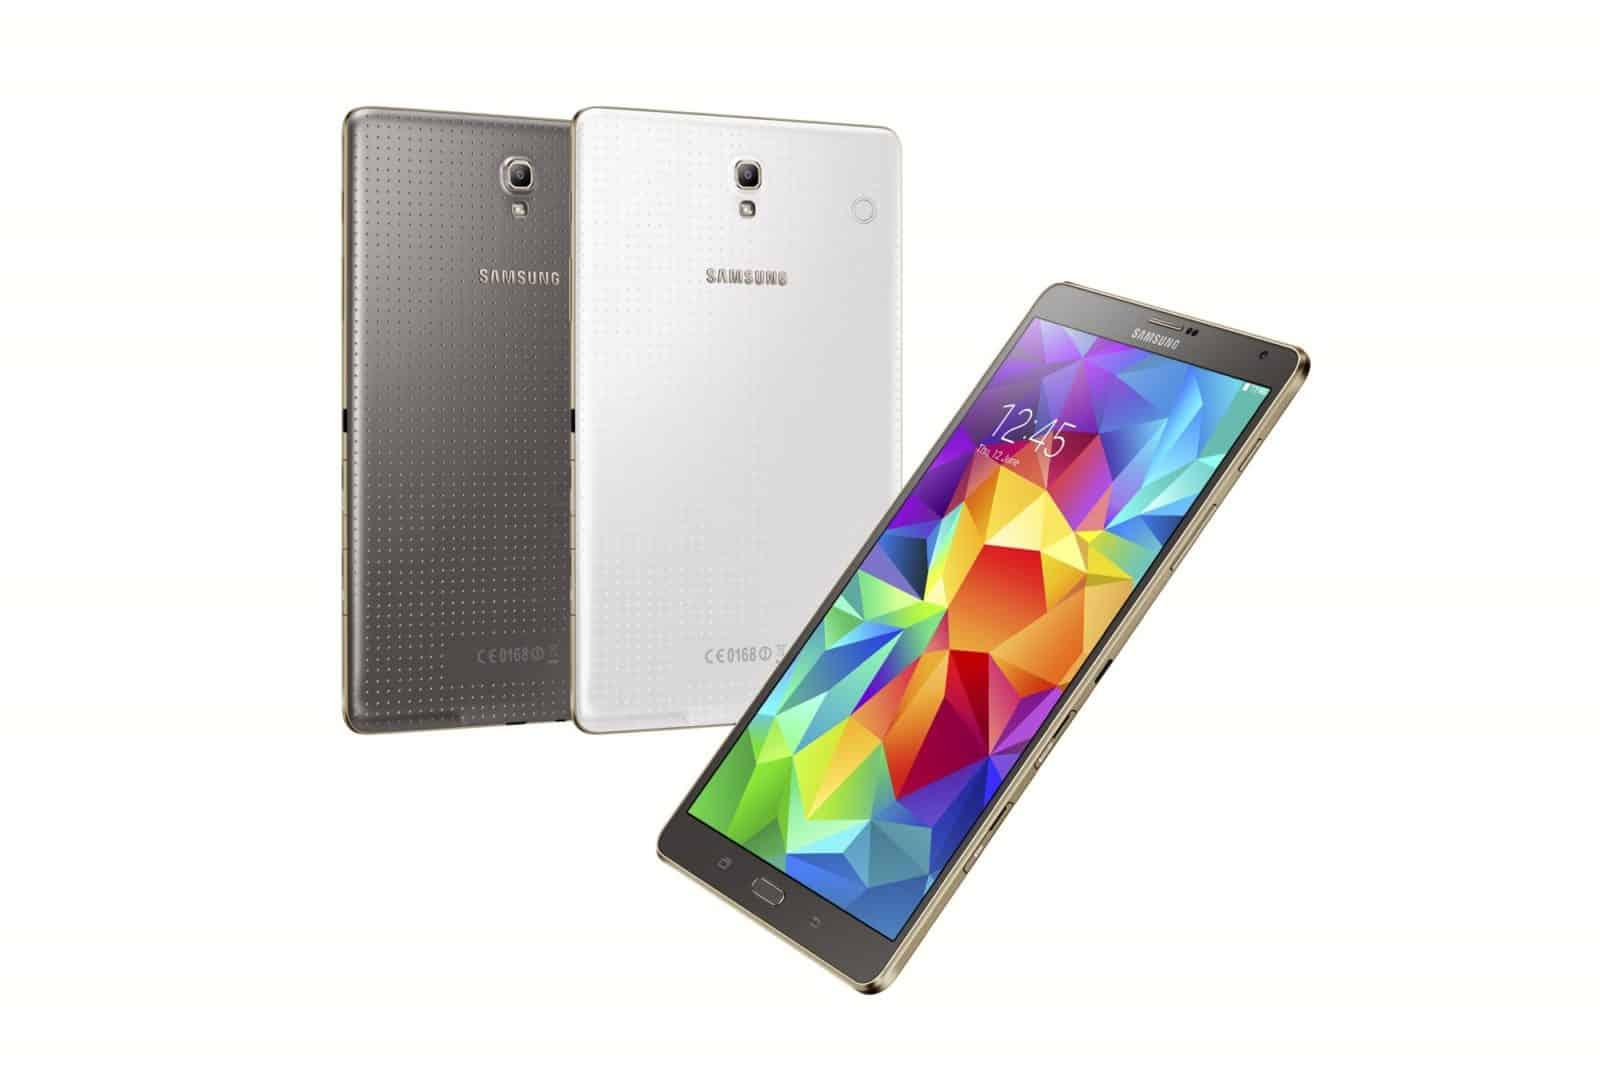 AH Samsung Galaxy Tab S 8.6